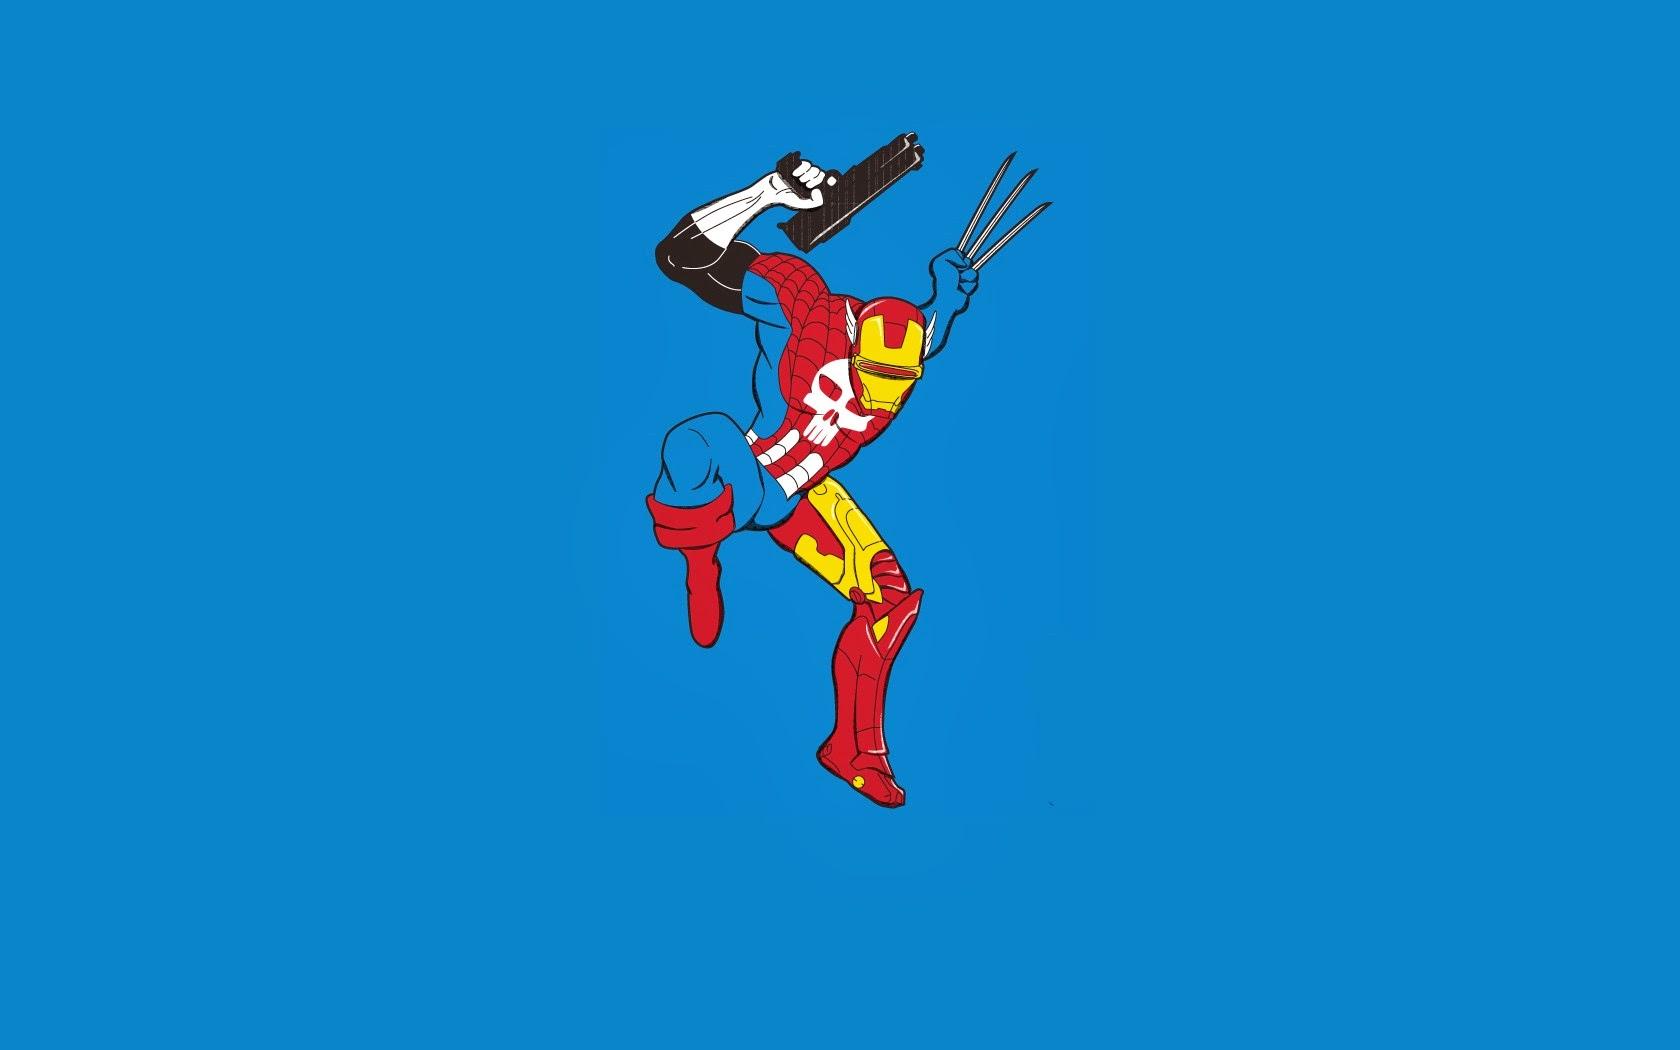 48+ Free Superhero Wallpaper Downloads on WallpaperSafari